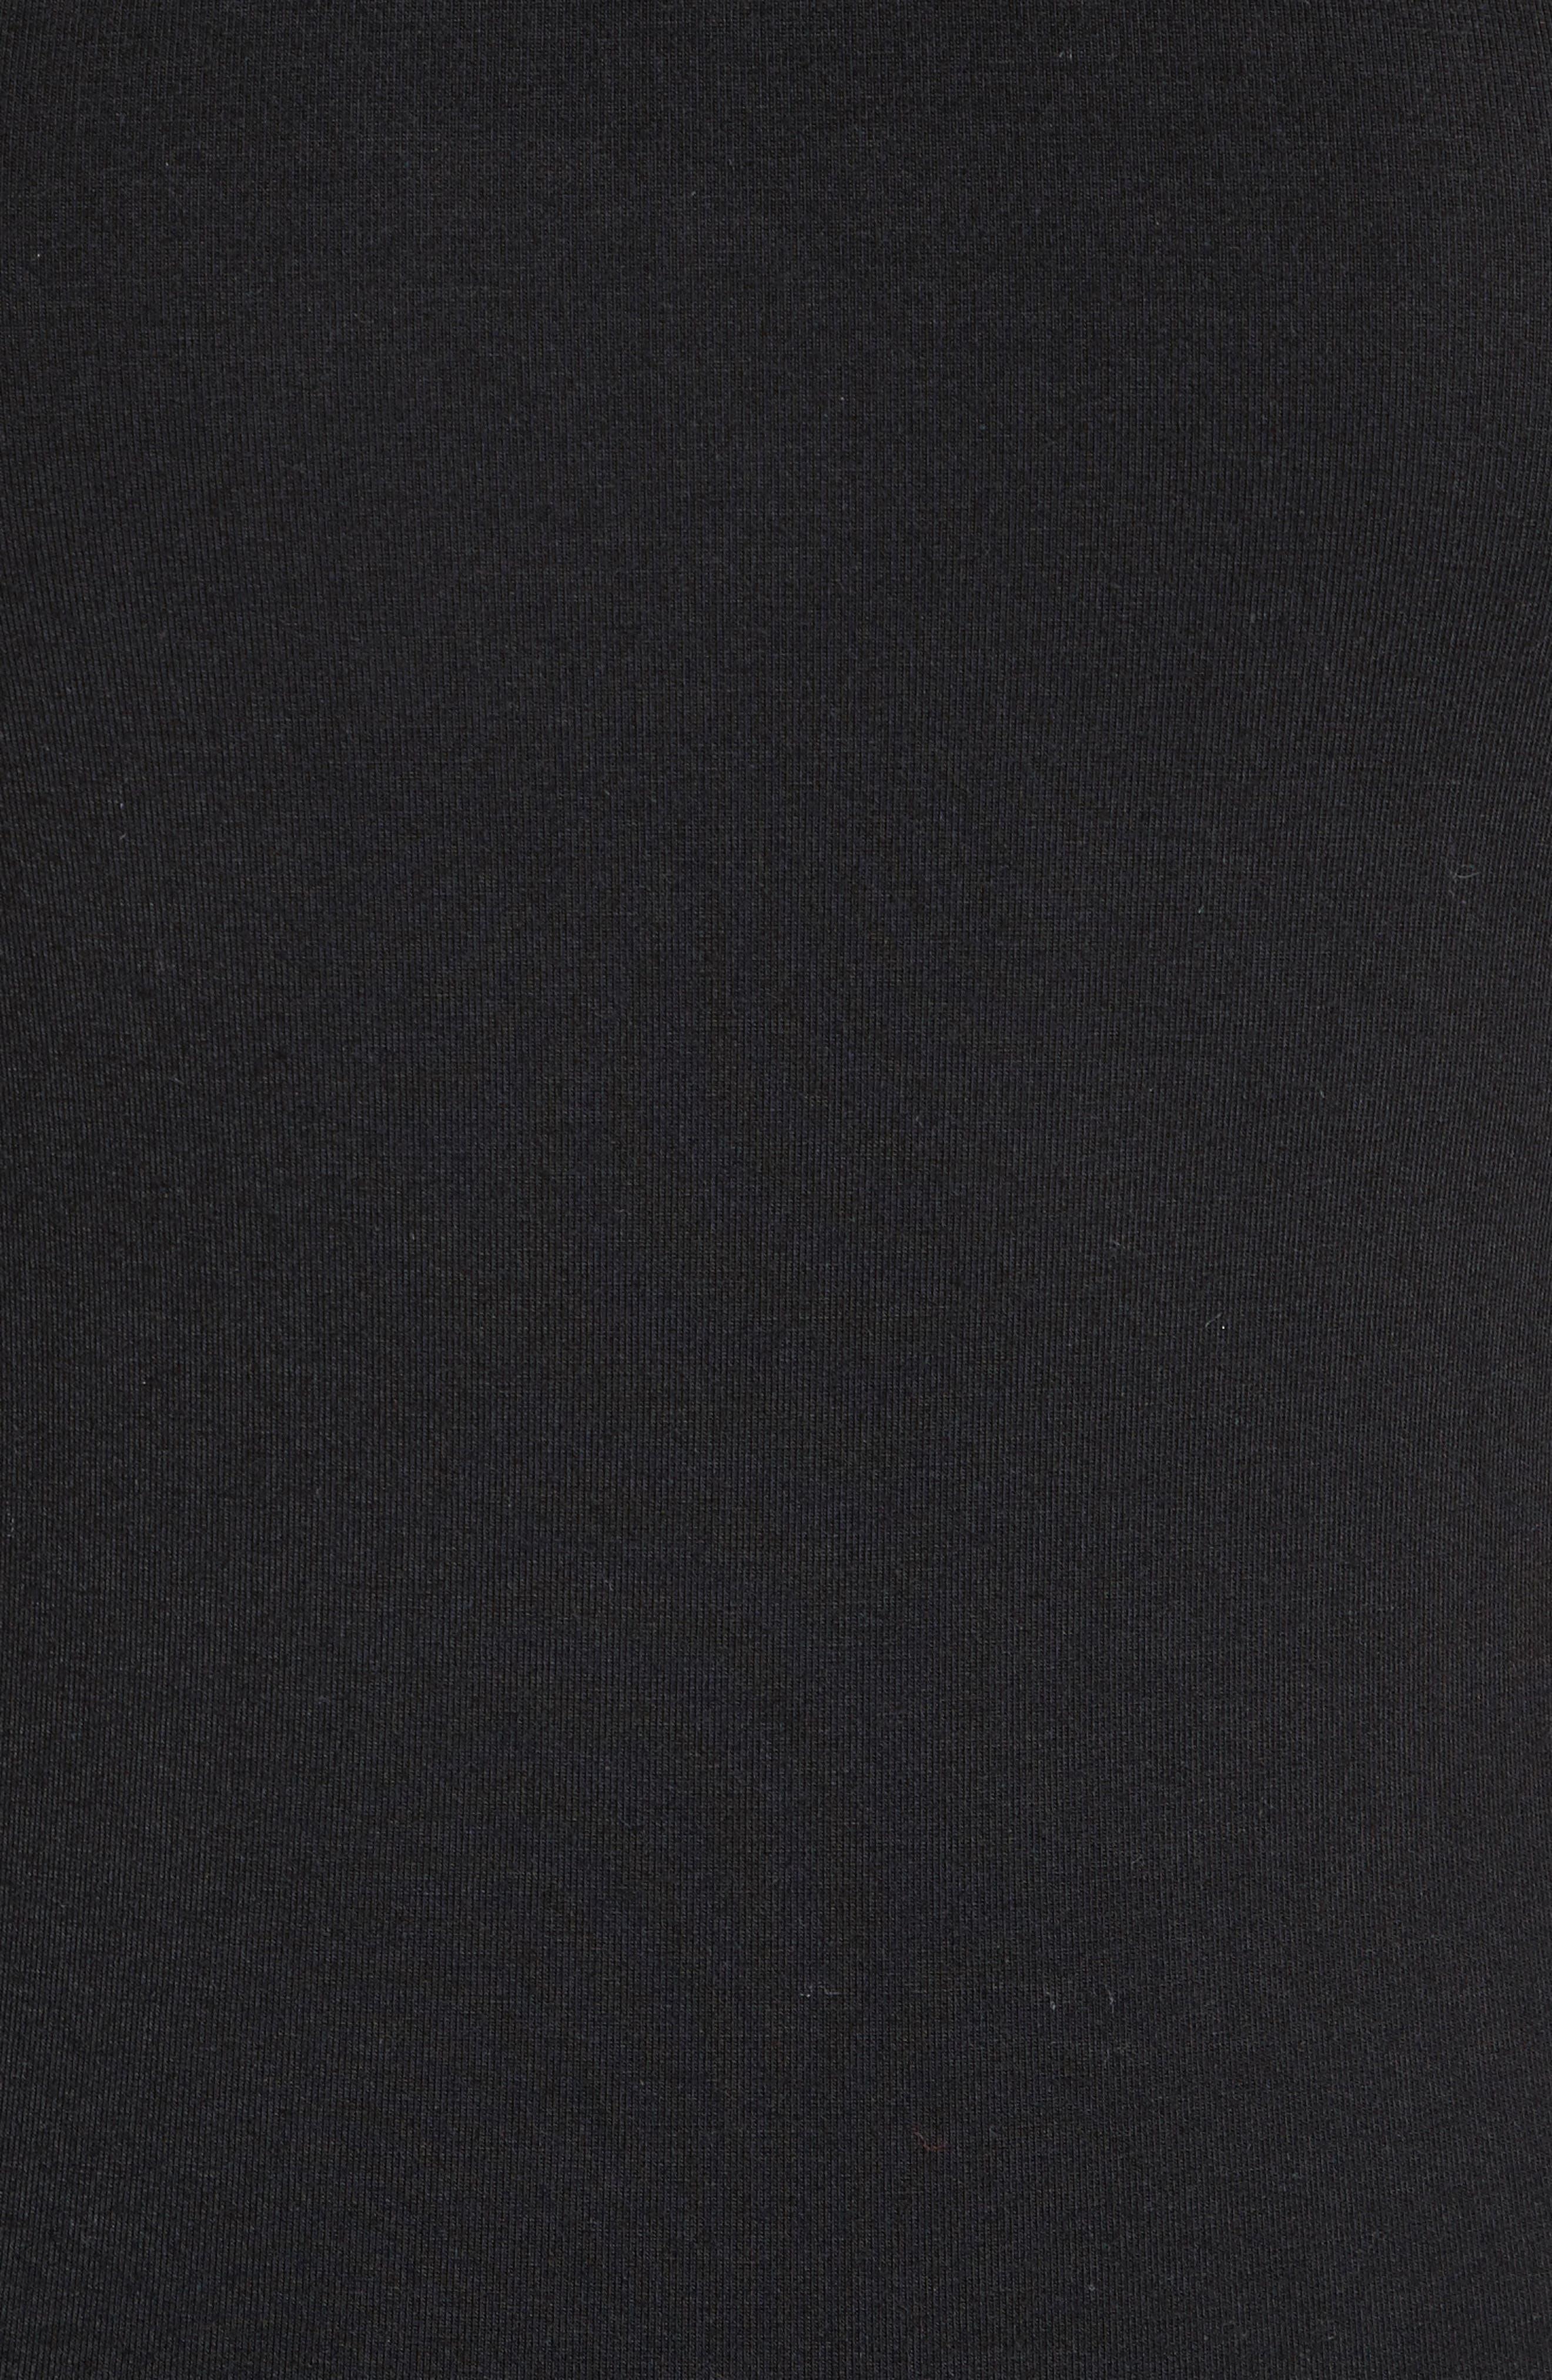 Cutaway Stretch Jersey Bodysuit,                             Alternate thumbnail 5, color,                             Black